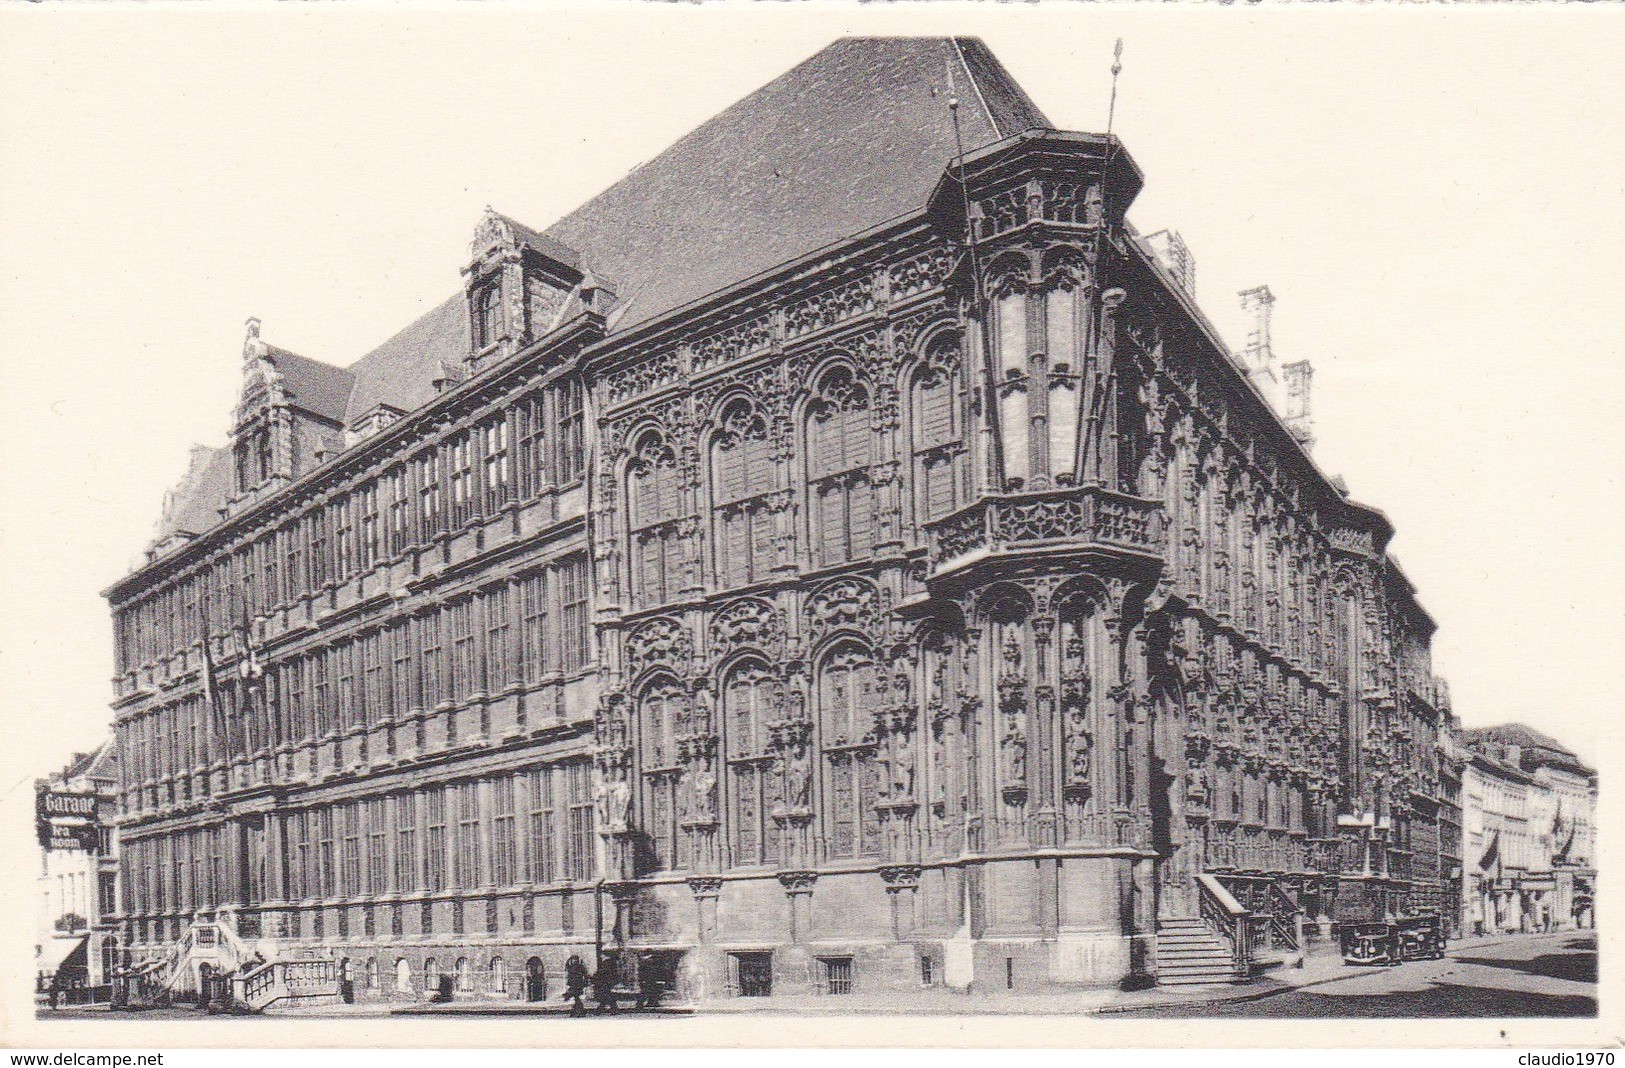 CARTOLINA - POSTCARD - BELGIO - GENT - HOTEL DE VILLE - Gent